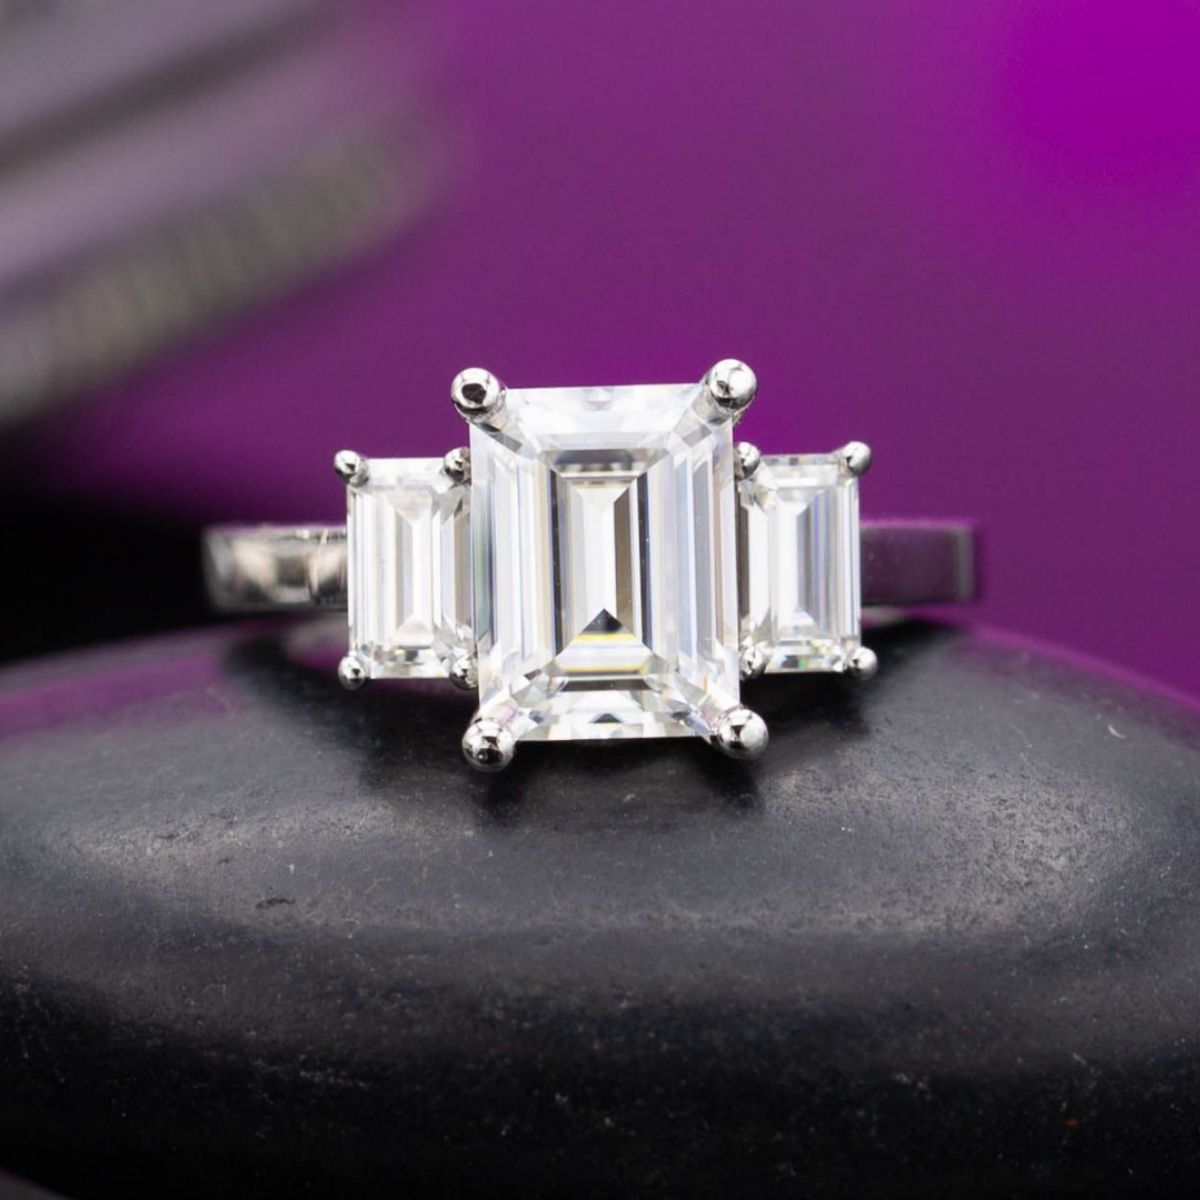 Moissanite vs Diamond: Beauty, Durability, and Price - Gem